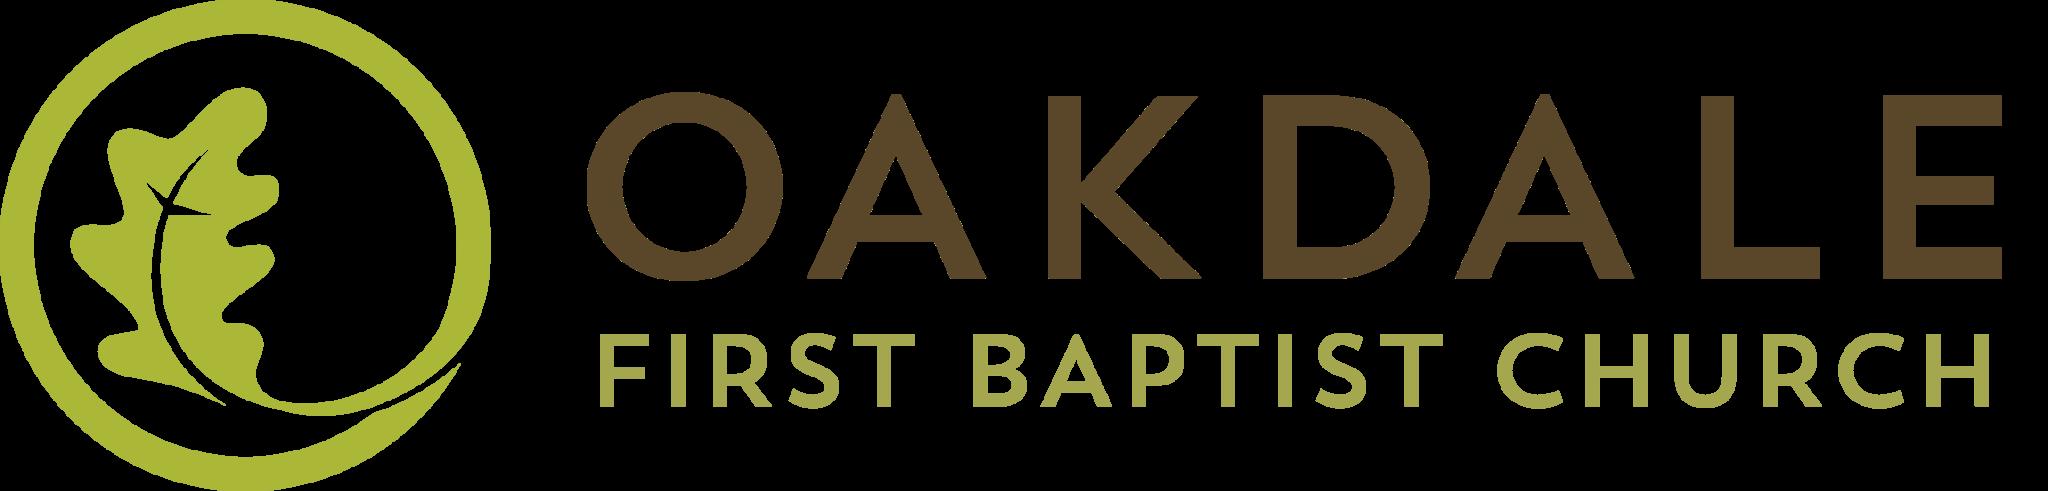 Oakdale First Baptist Church's Horizontal Logo